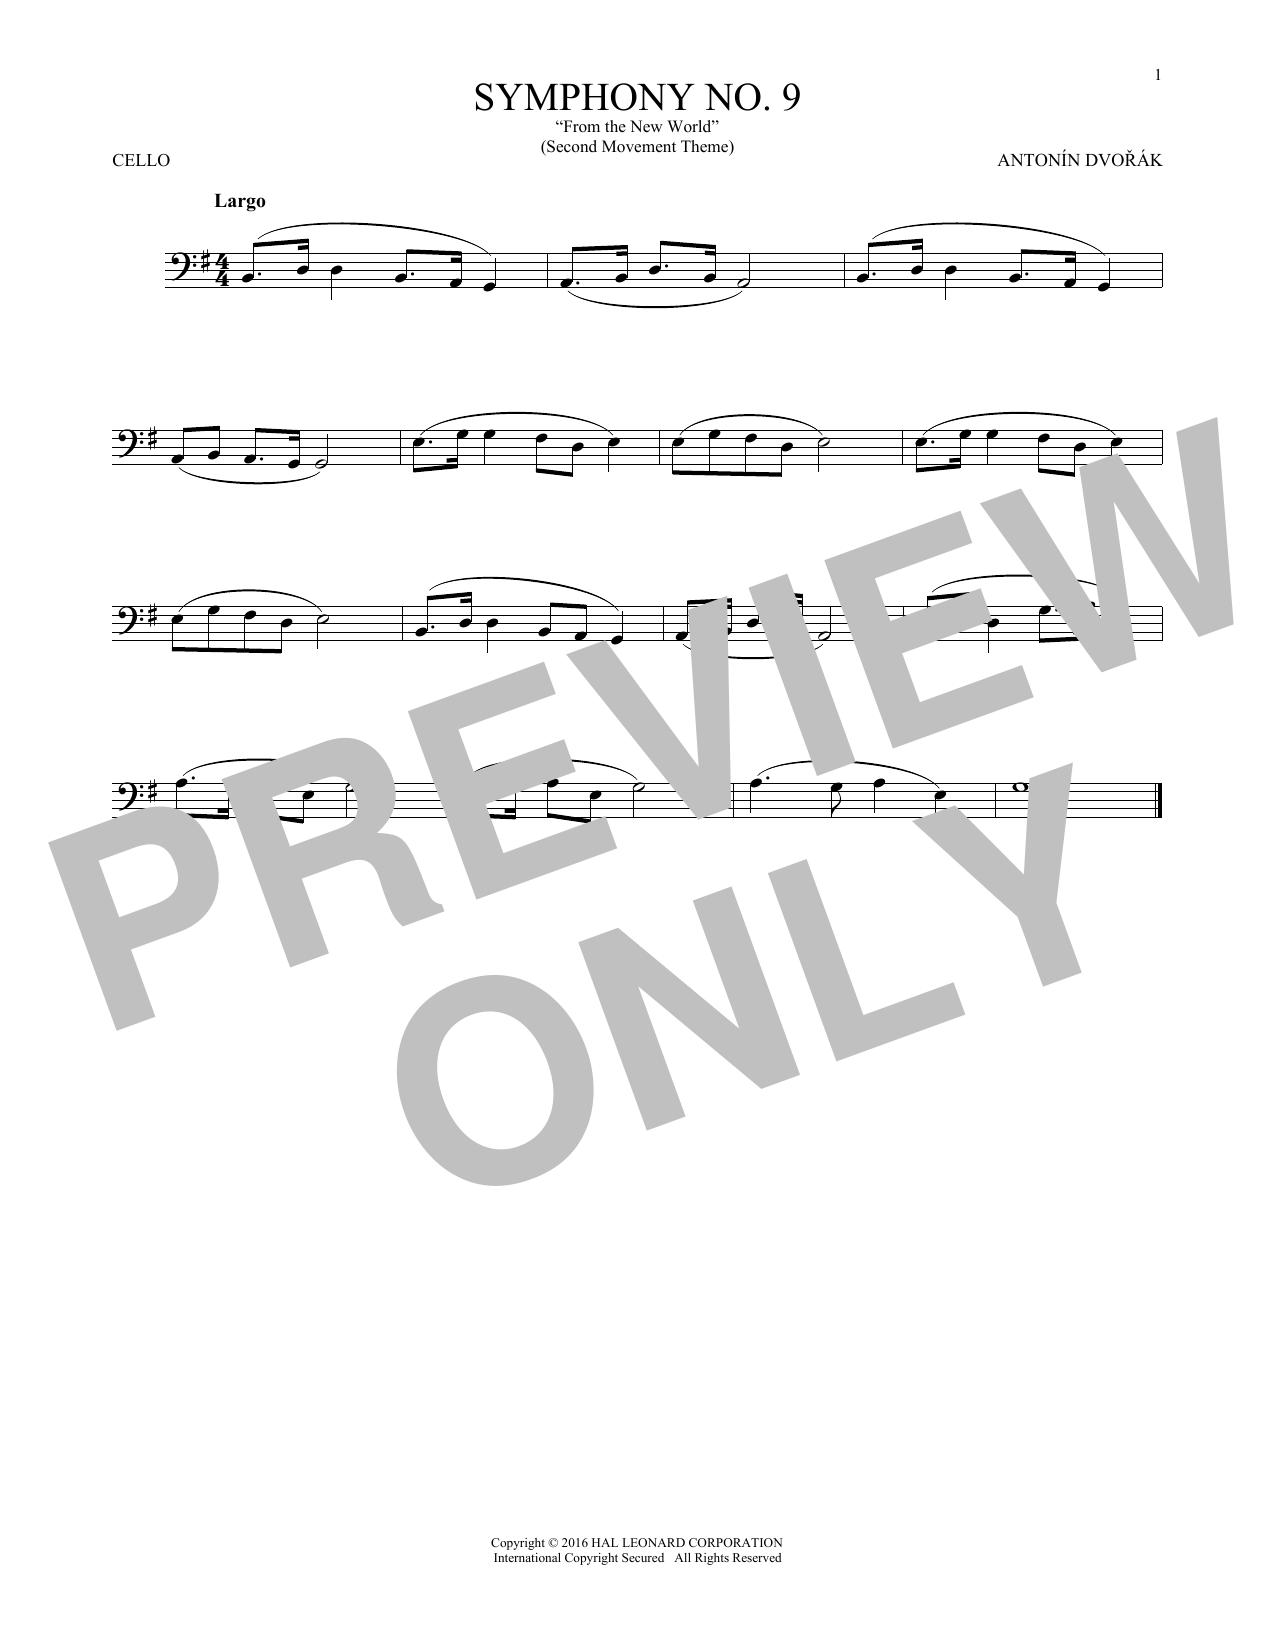 Antonin Dvorak Largo From Symphony No. 9 (